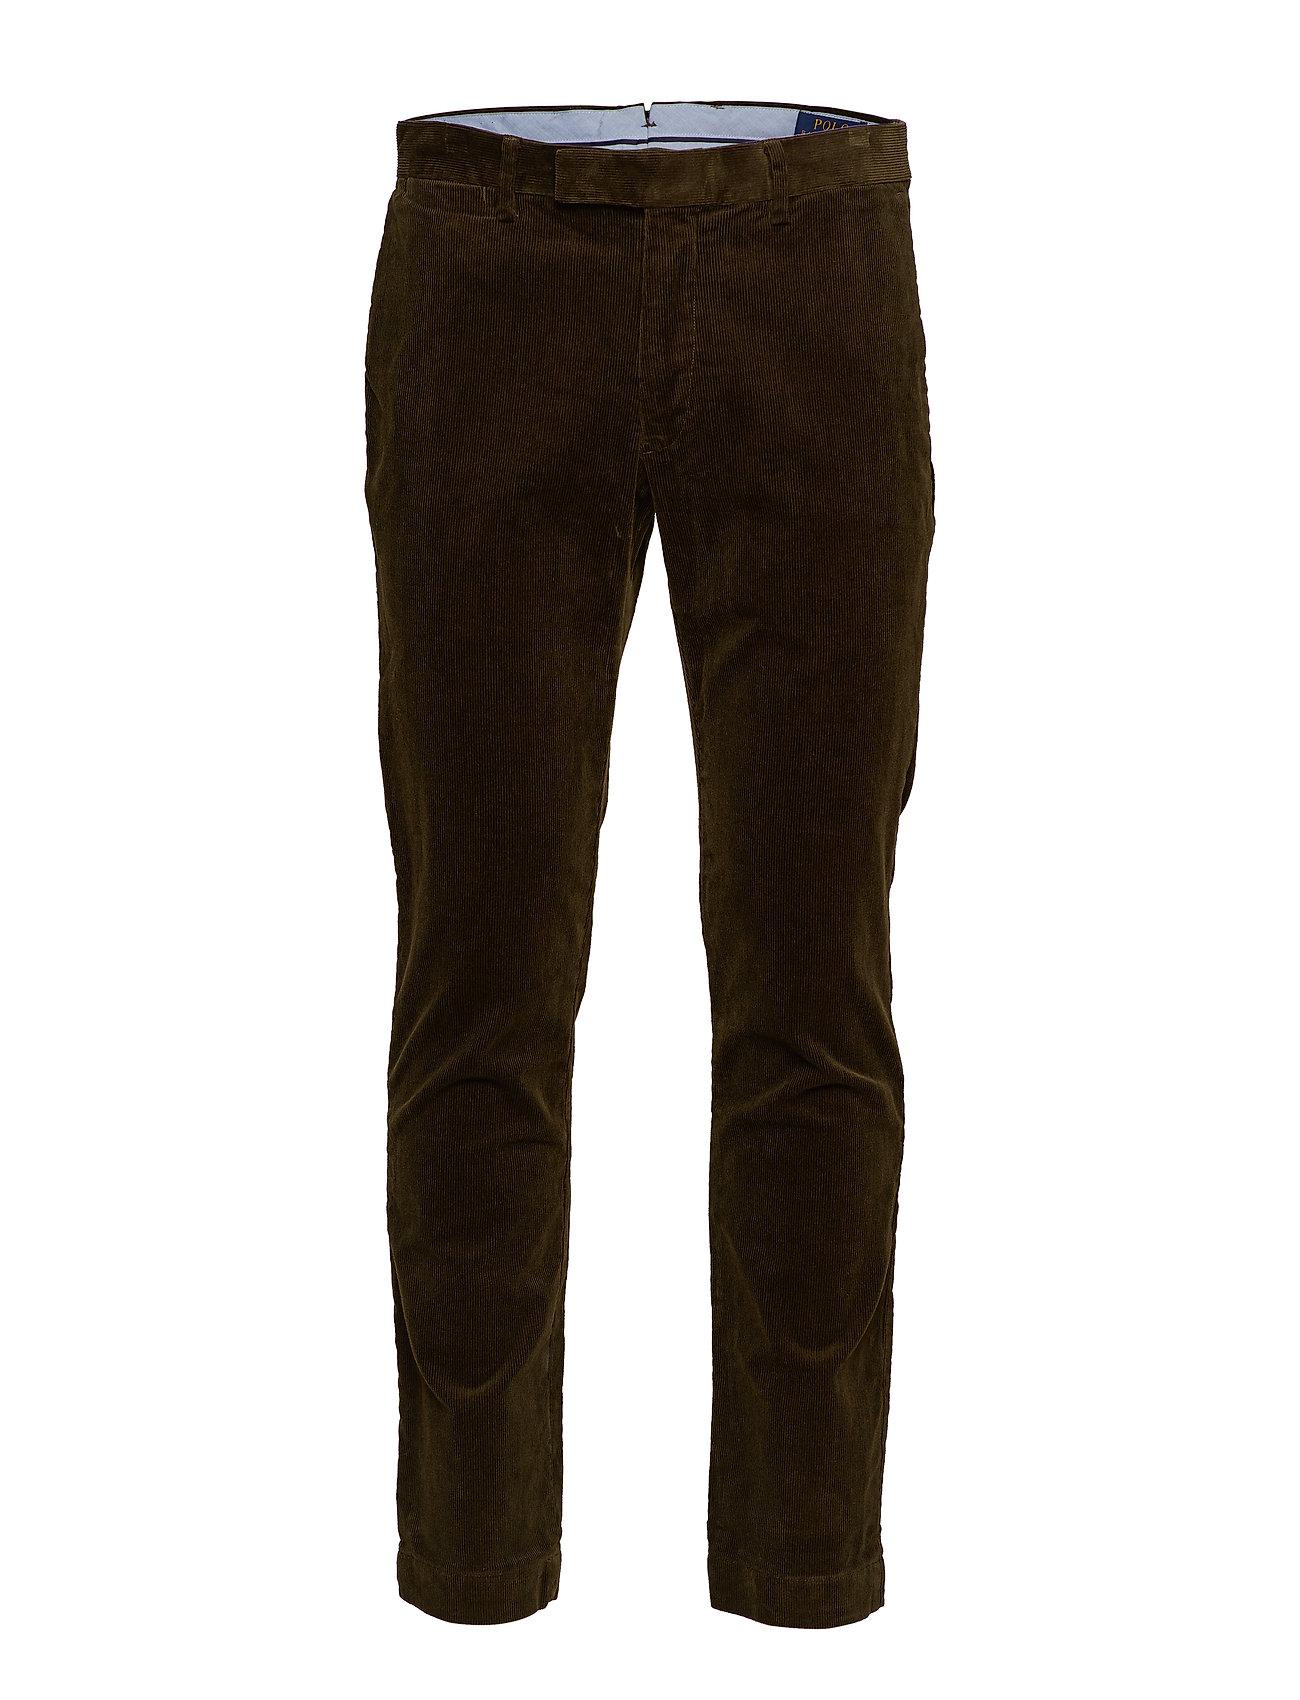 Polo Ralph Lauren Stretch Slim Fit Corduroy Pant - COMPANY OLIVE